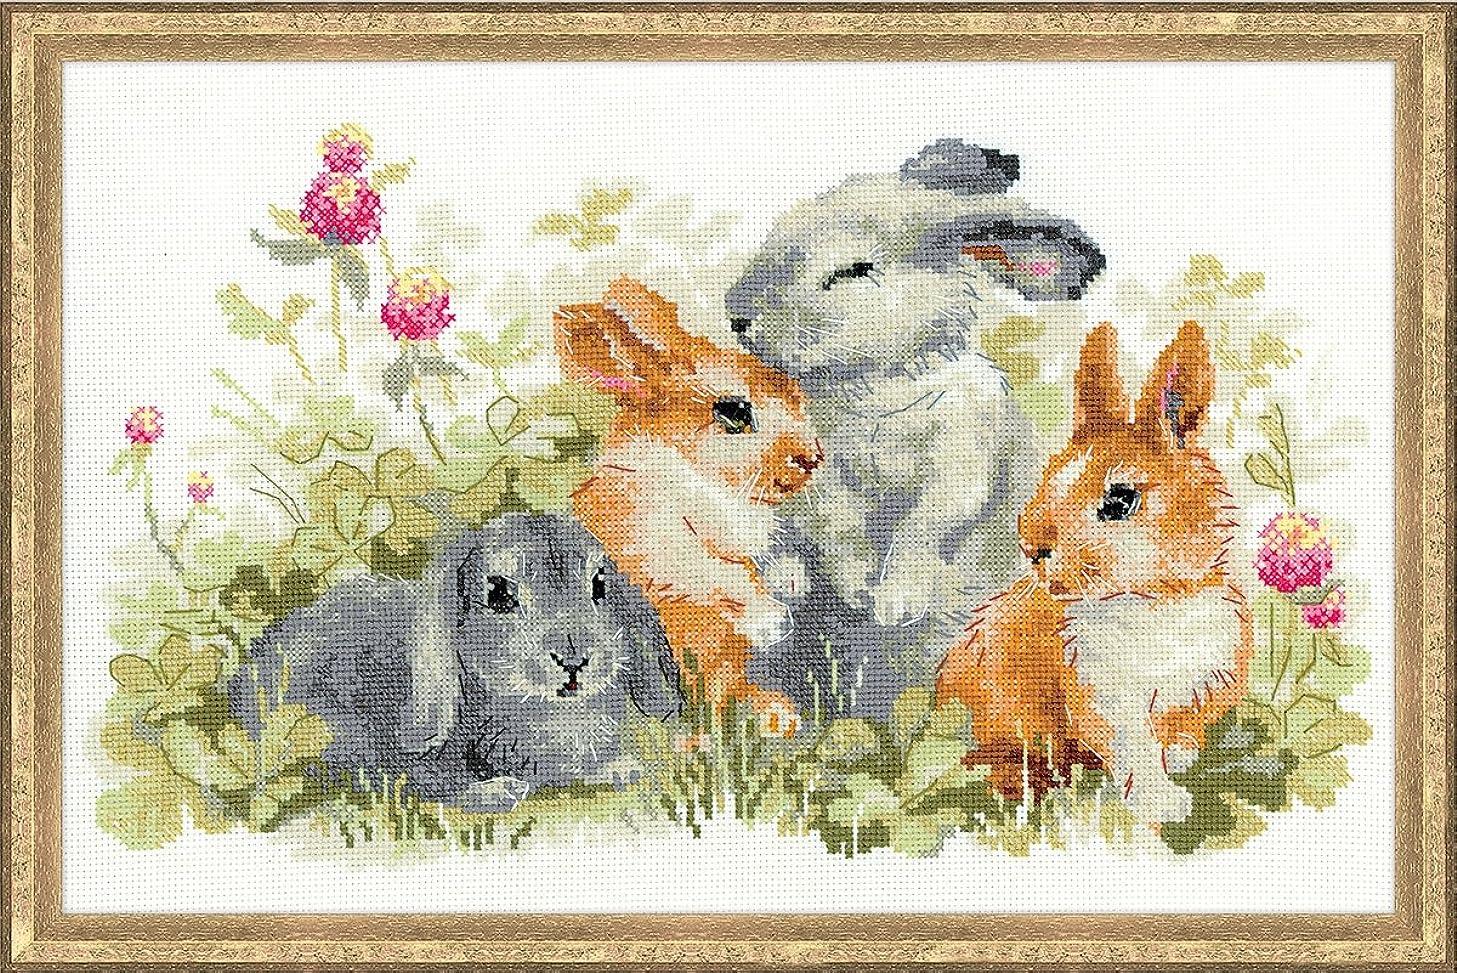 RIOLIS 1416 - Funny Rabbits - Counted Cross Stitch Kit 15?